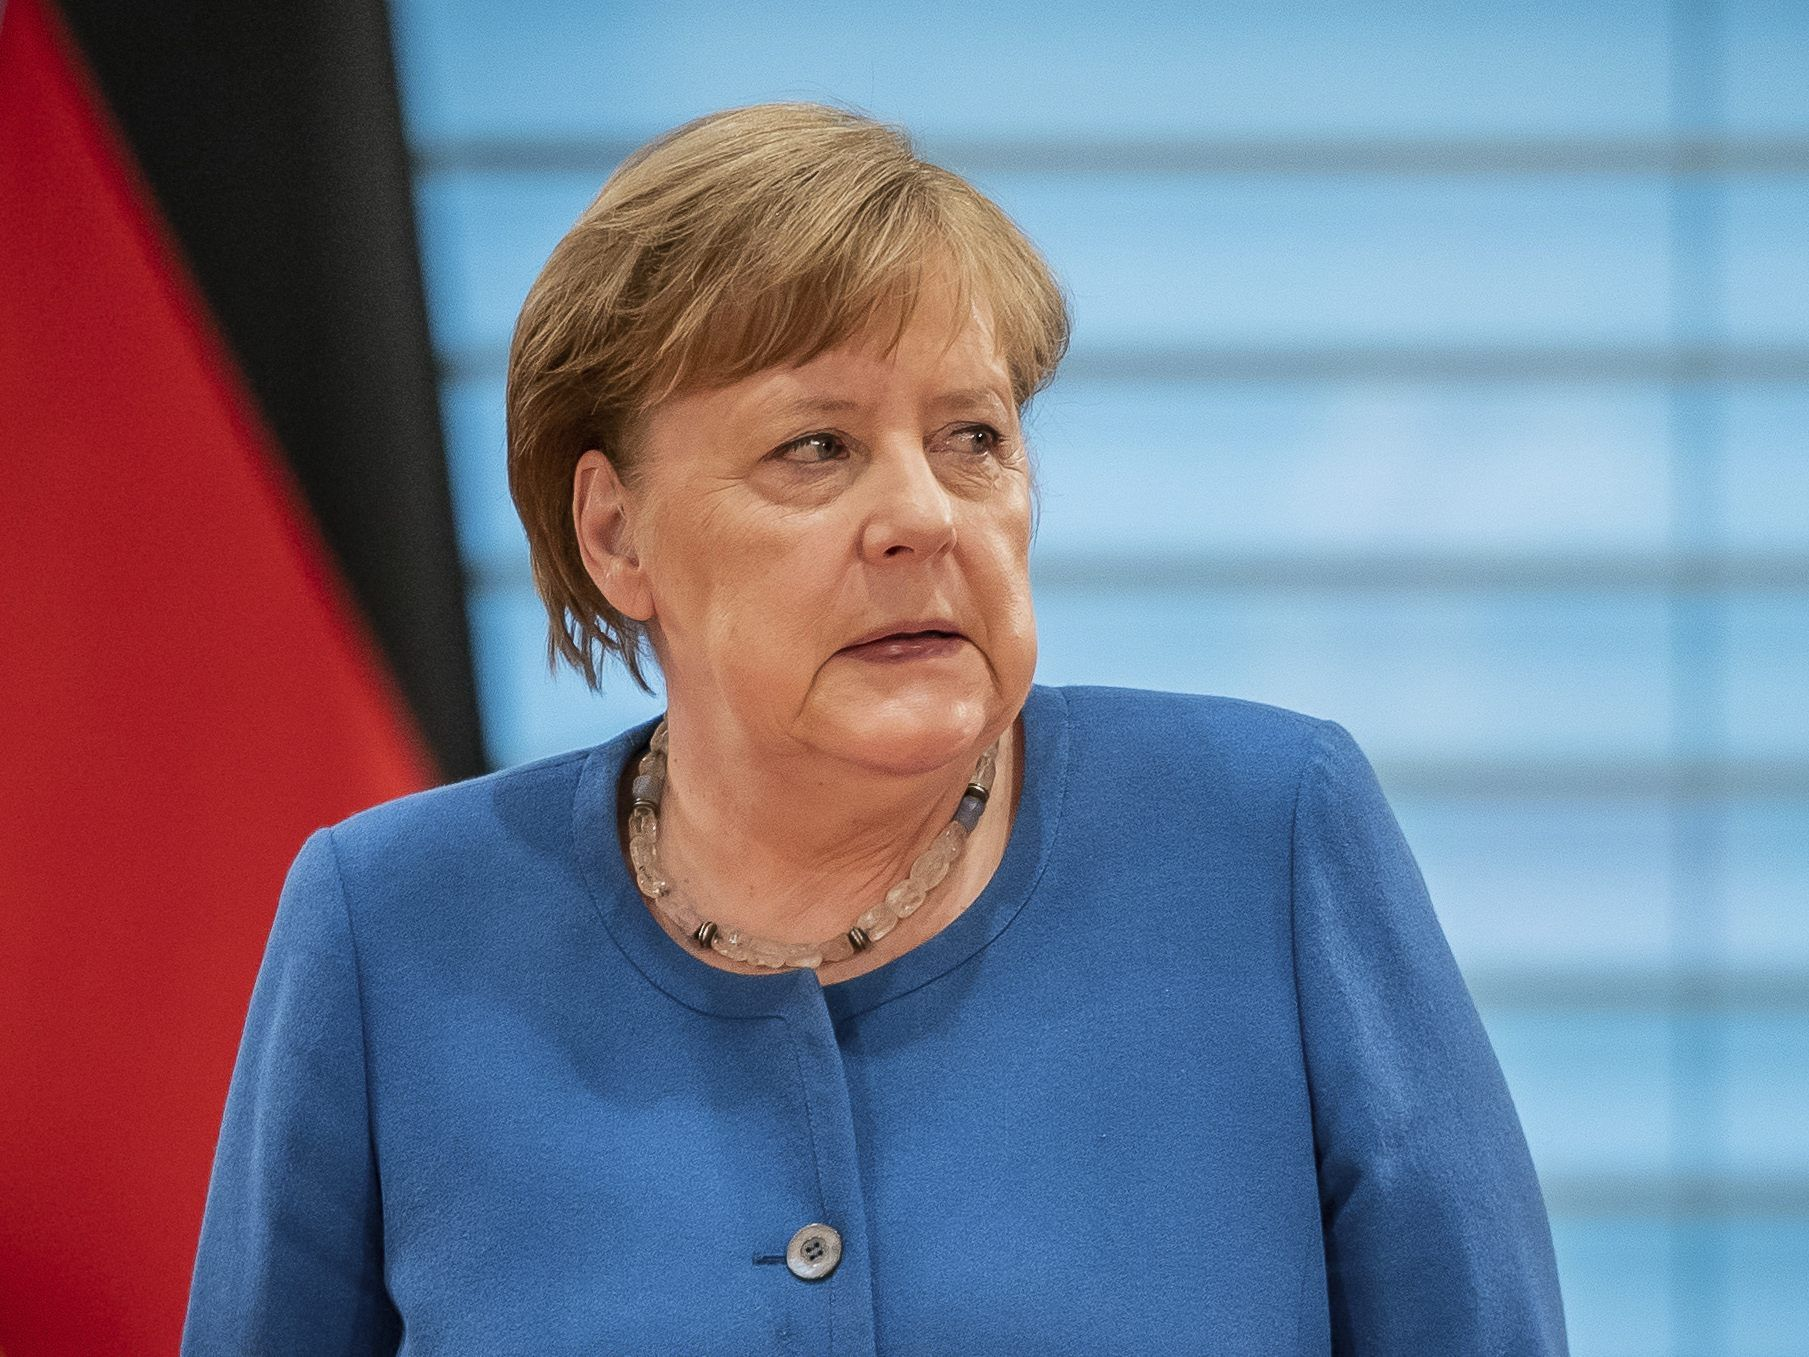 Covid-19 - Merkel muss in Quarantäne - Kontakt zu positiv getestetem Arzt